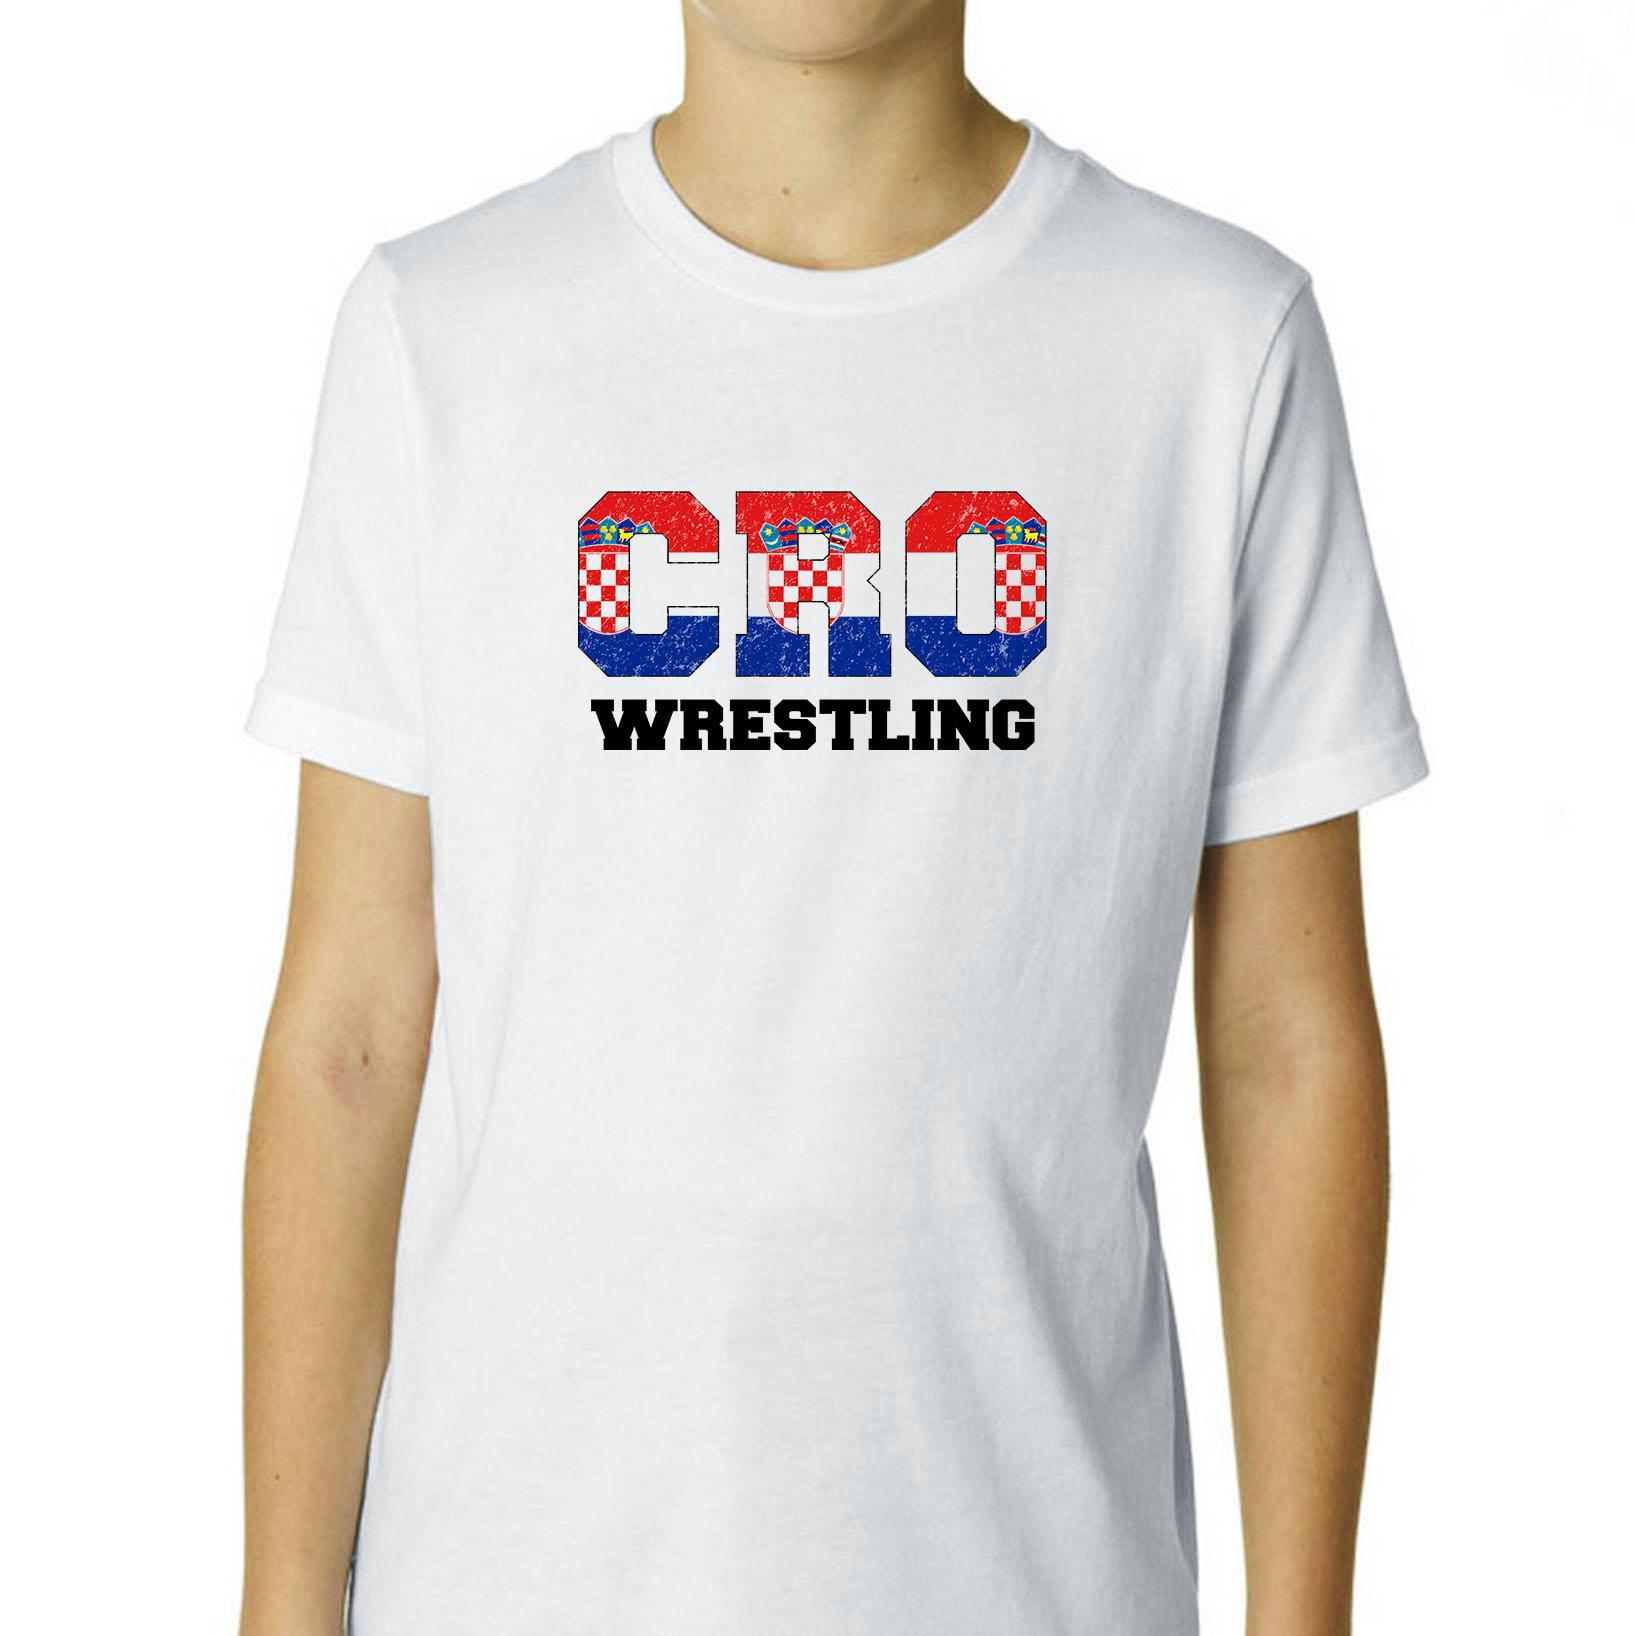 Croatia Wrestling Olympic Games Rio Flag Boy's Cotton Youth T-Shirt by Hollywood Thread